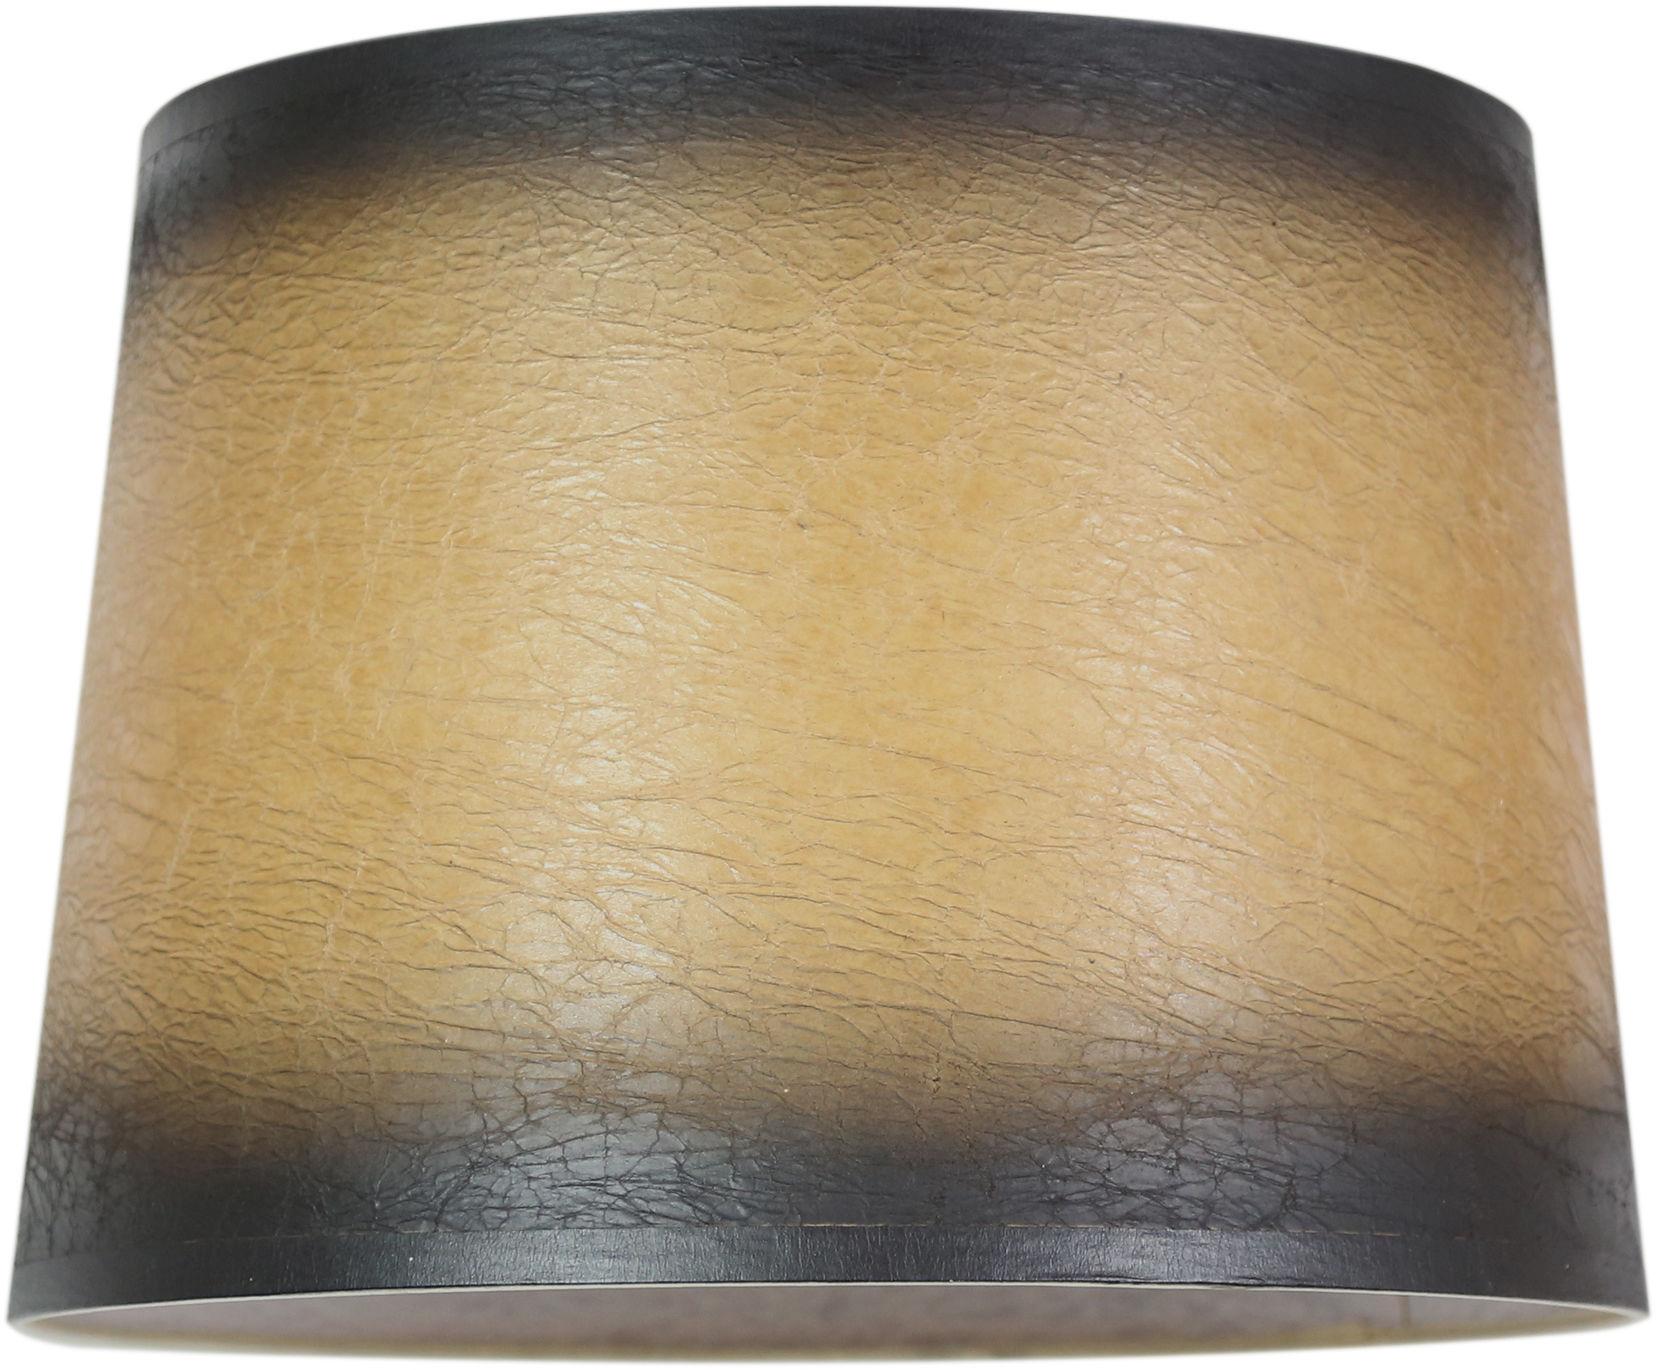 Candellux SANDY plafon lampa sufitowa abażur 1X60W E27 33cm